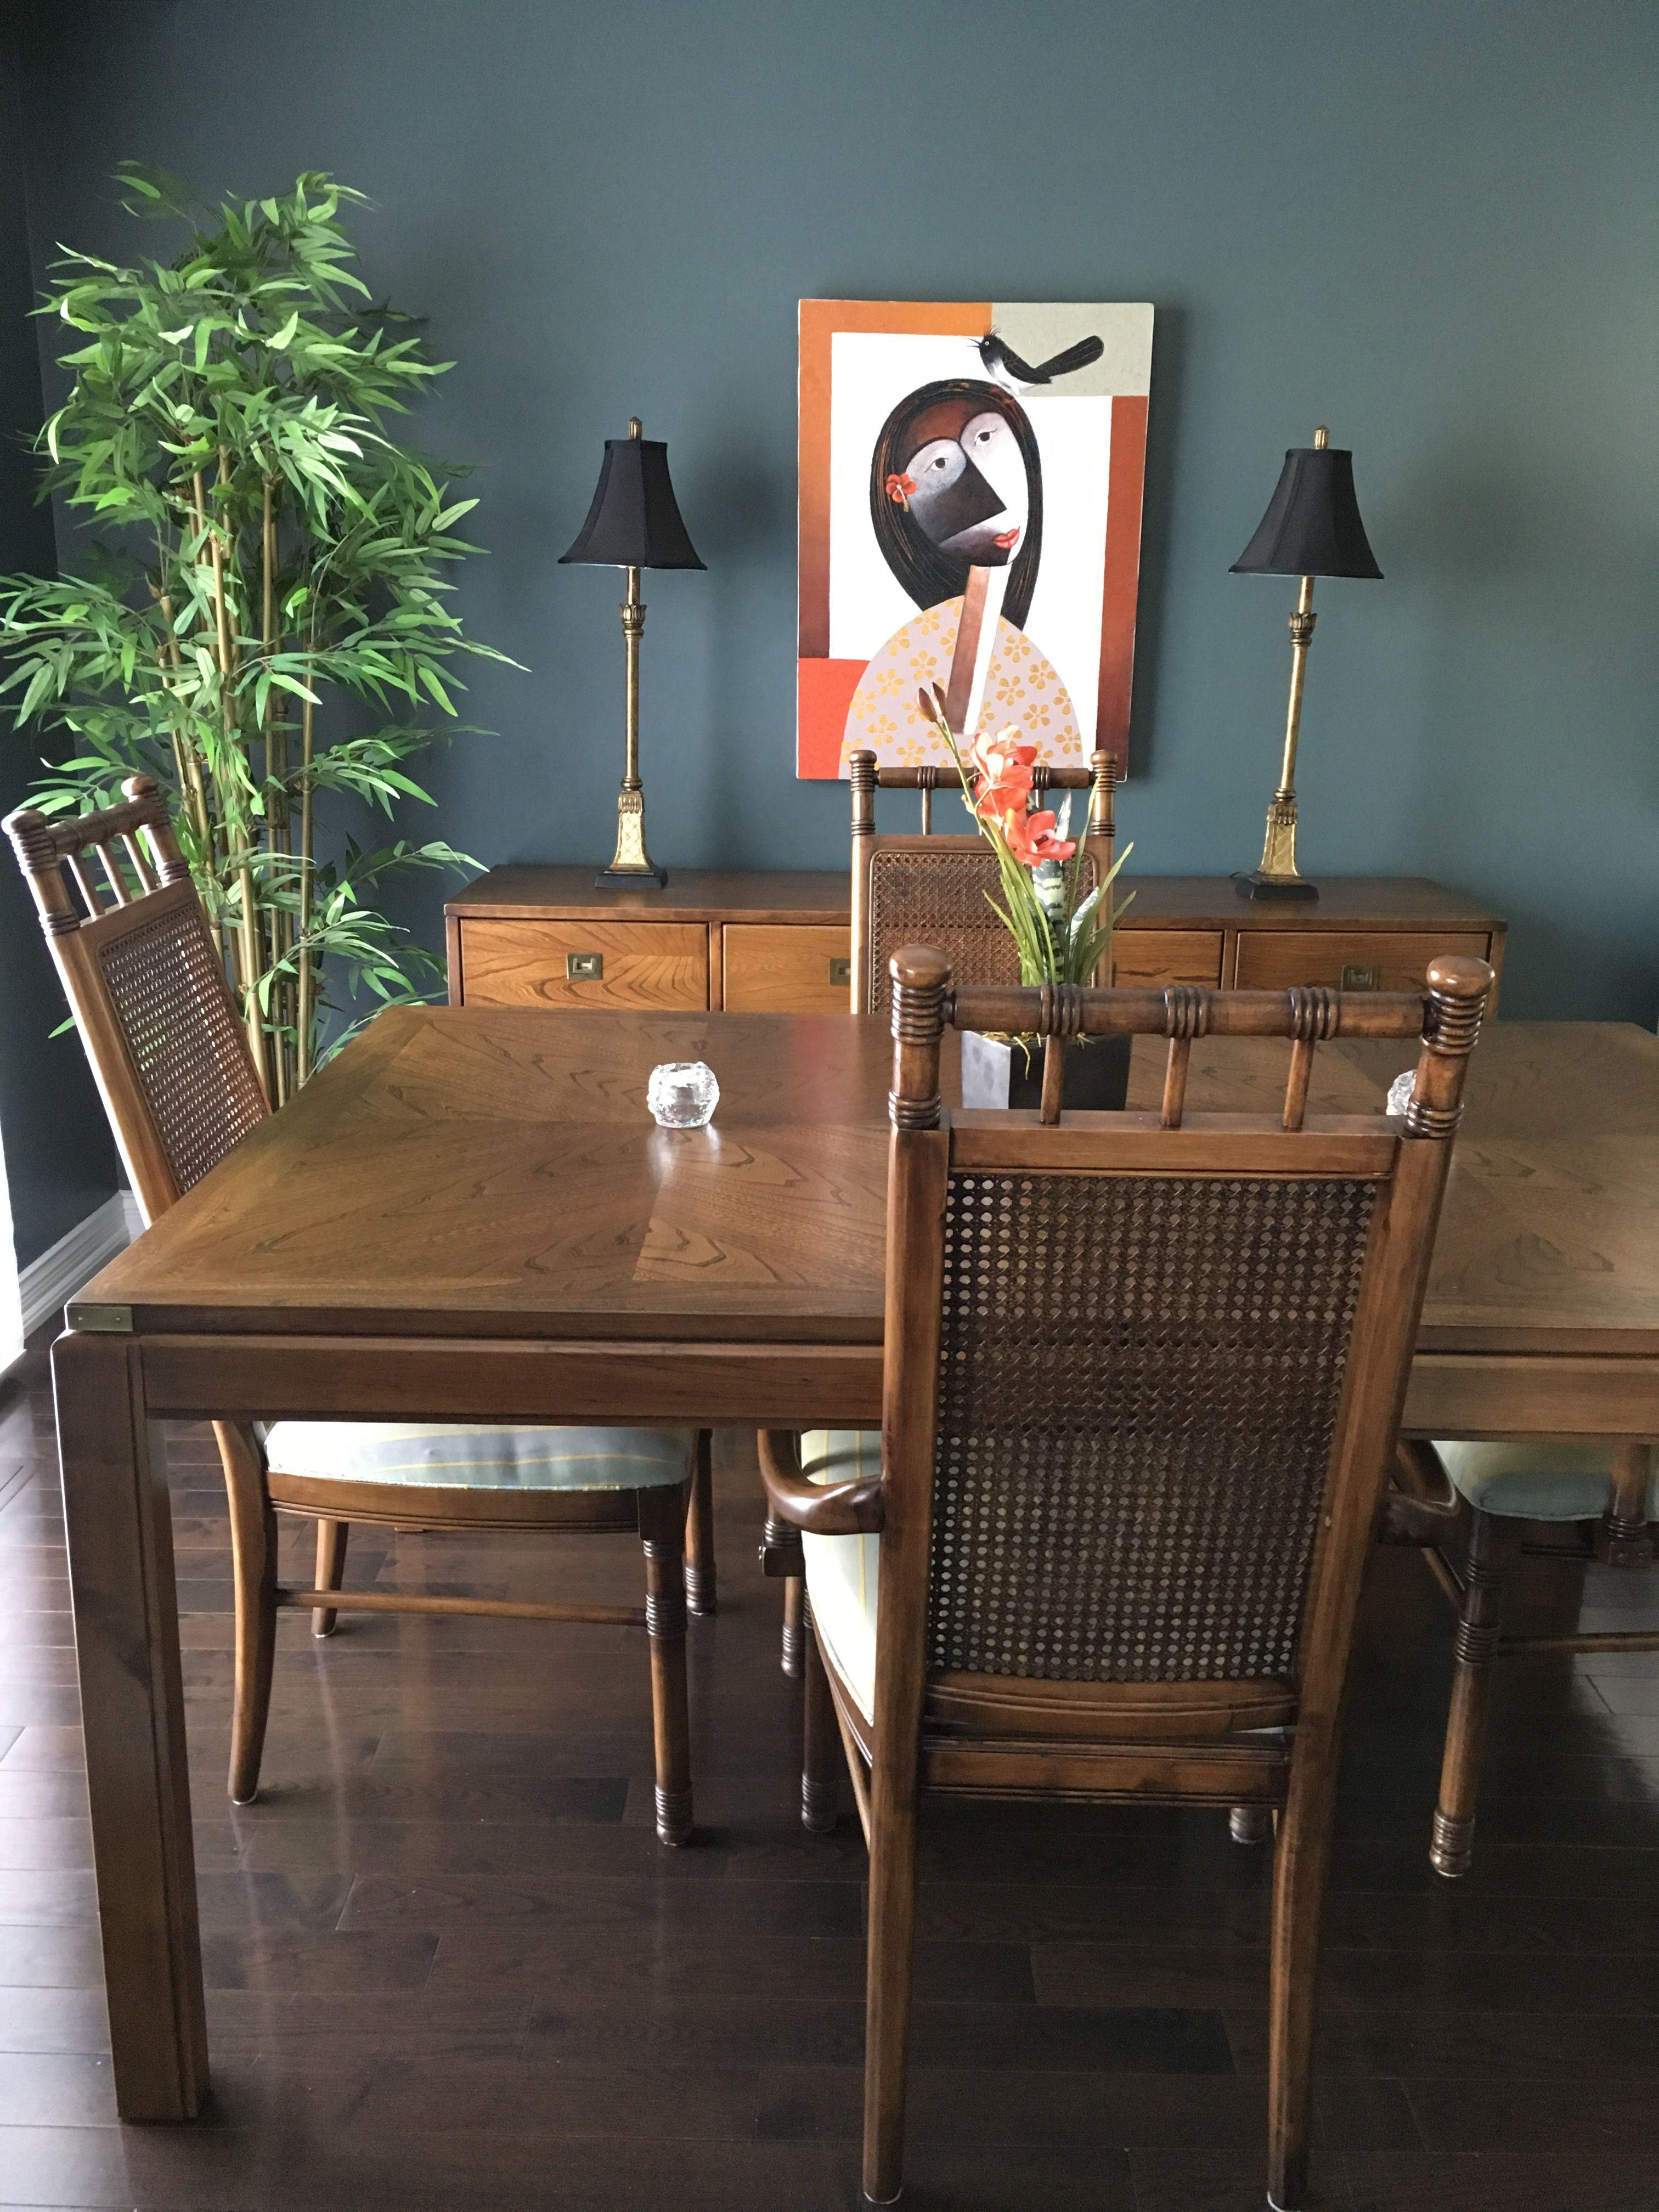 Benjamin Moore - Knoxville Gray | Design on a Dime (Decor ...